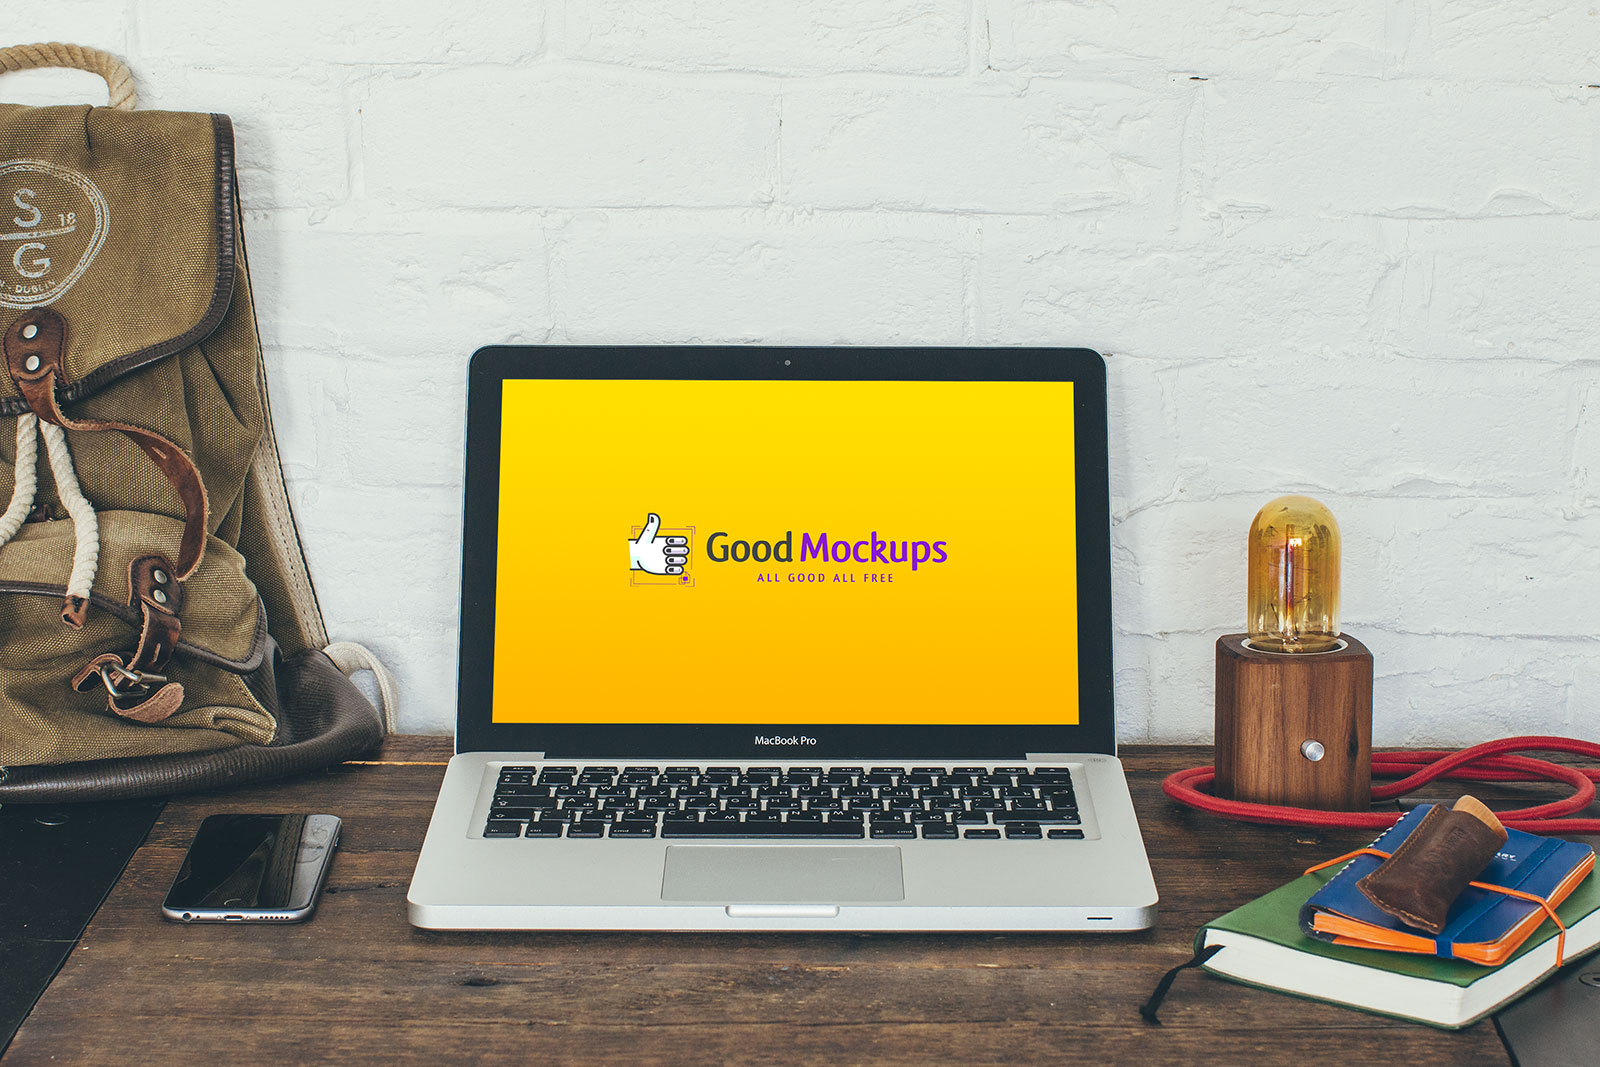 Free-Apple-MacBook-Pro-Workspace-Mockup-PSD-Files